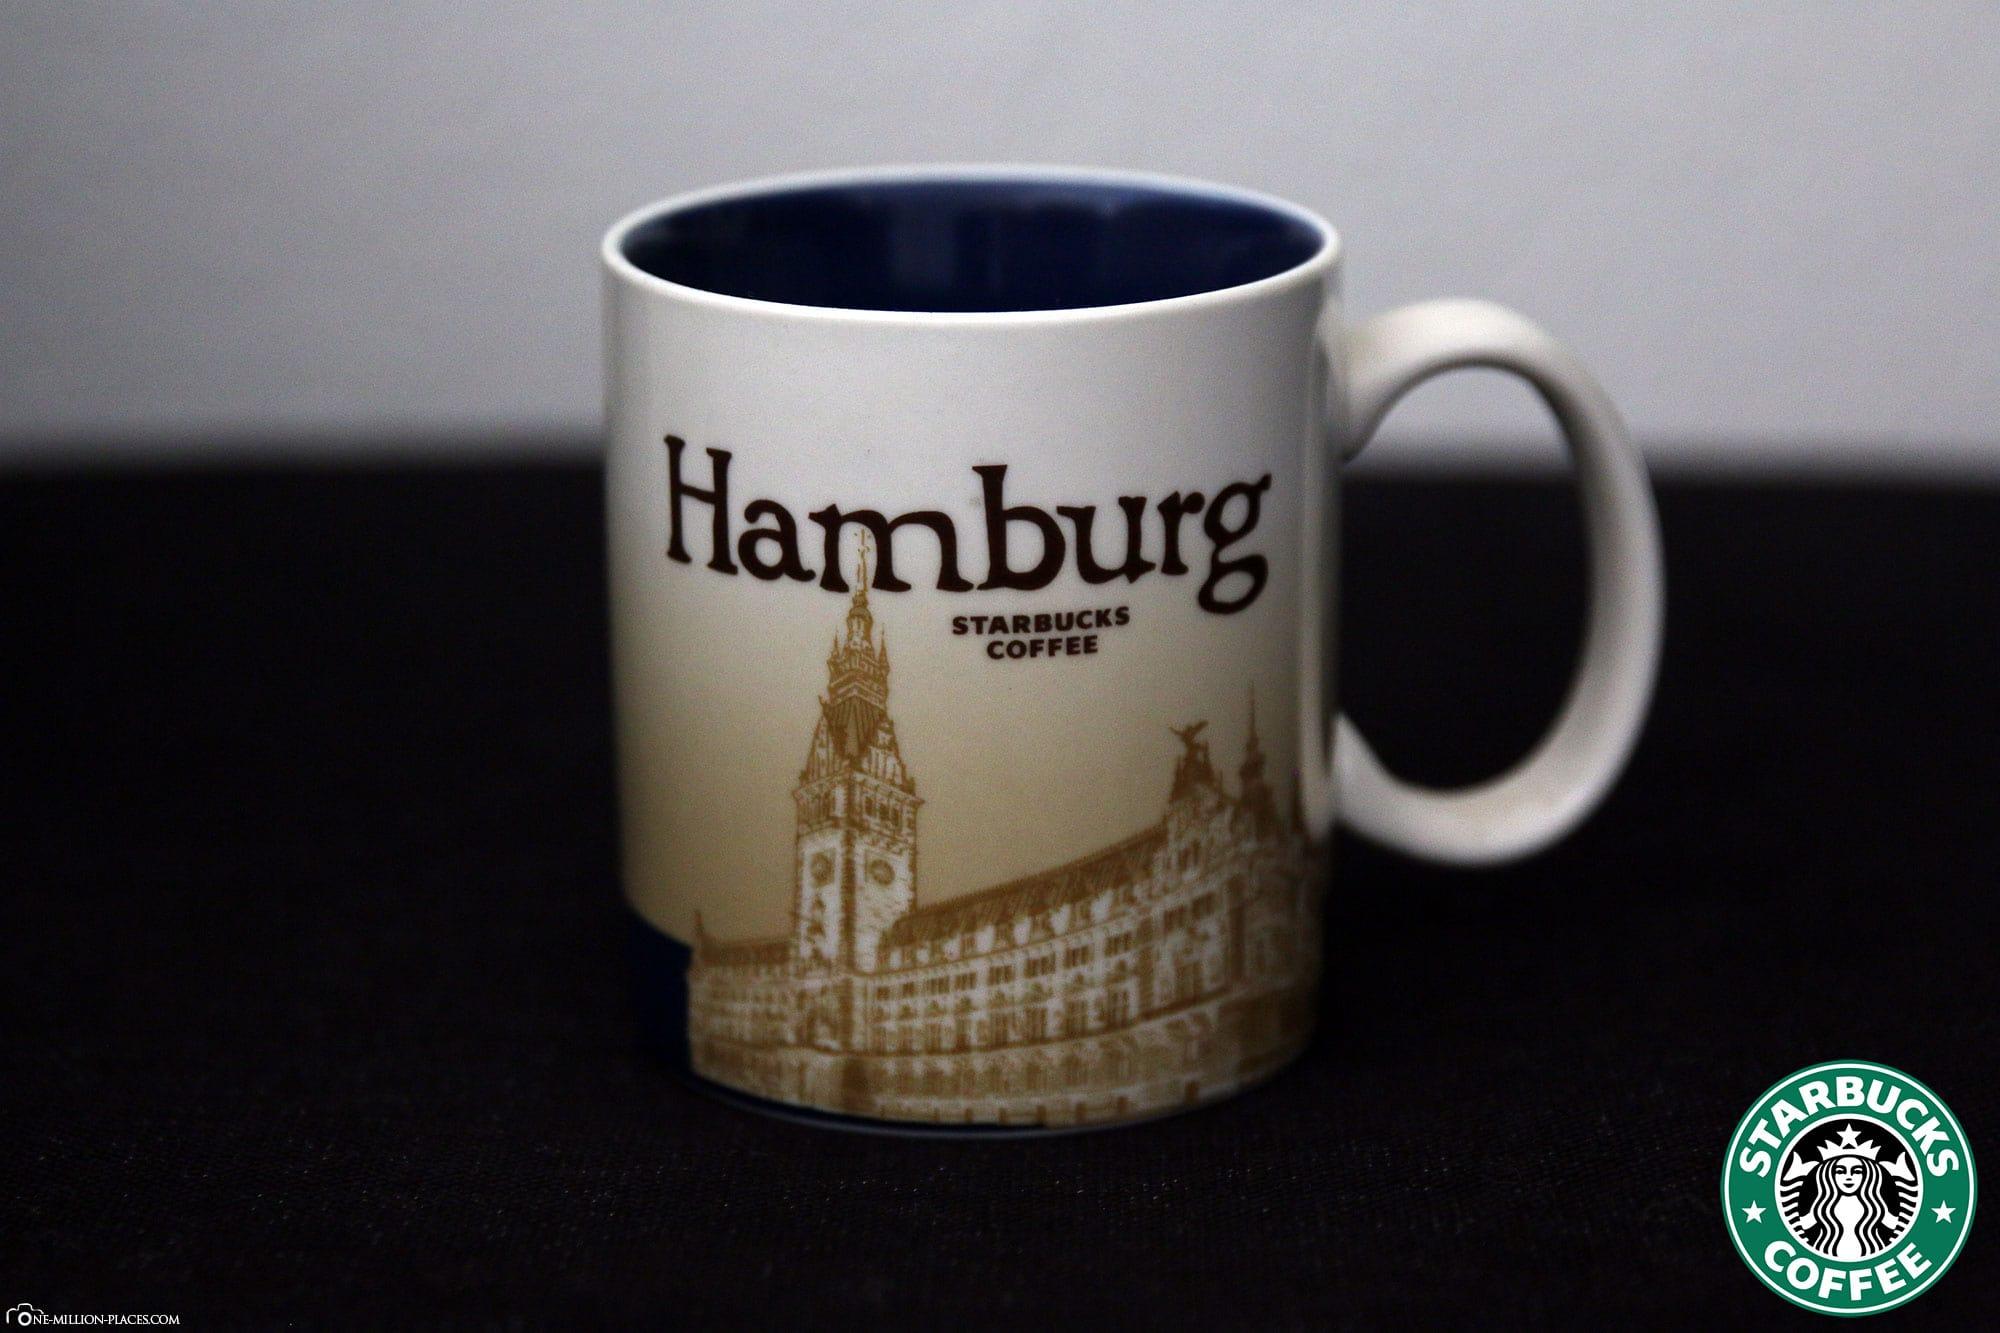 Hamburg, Starbucks Cup, Global Icon Series, City Mugs, Collection, Germany, Travelreport